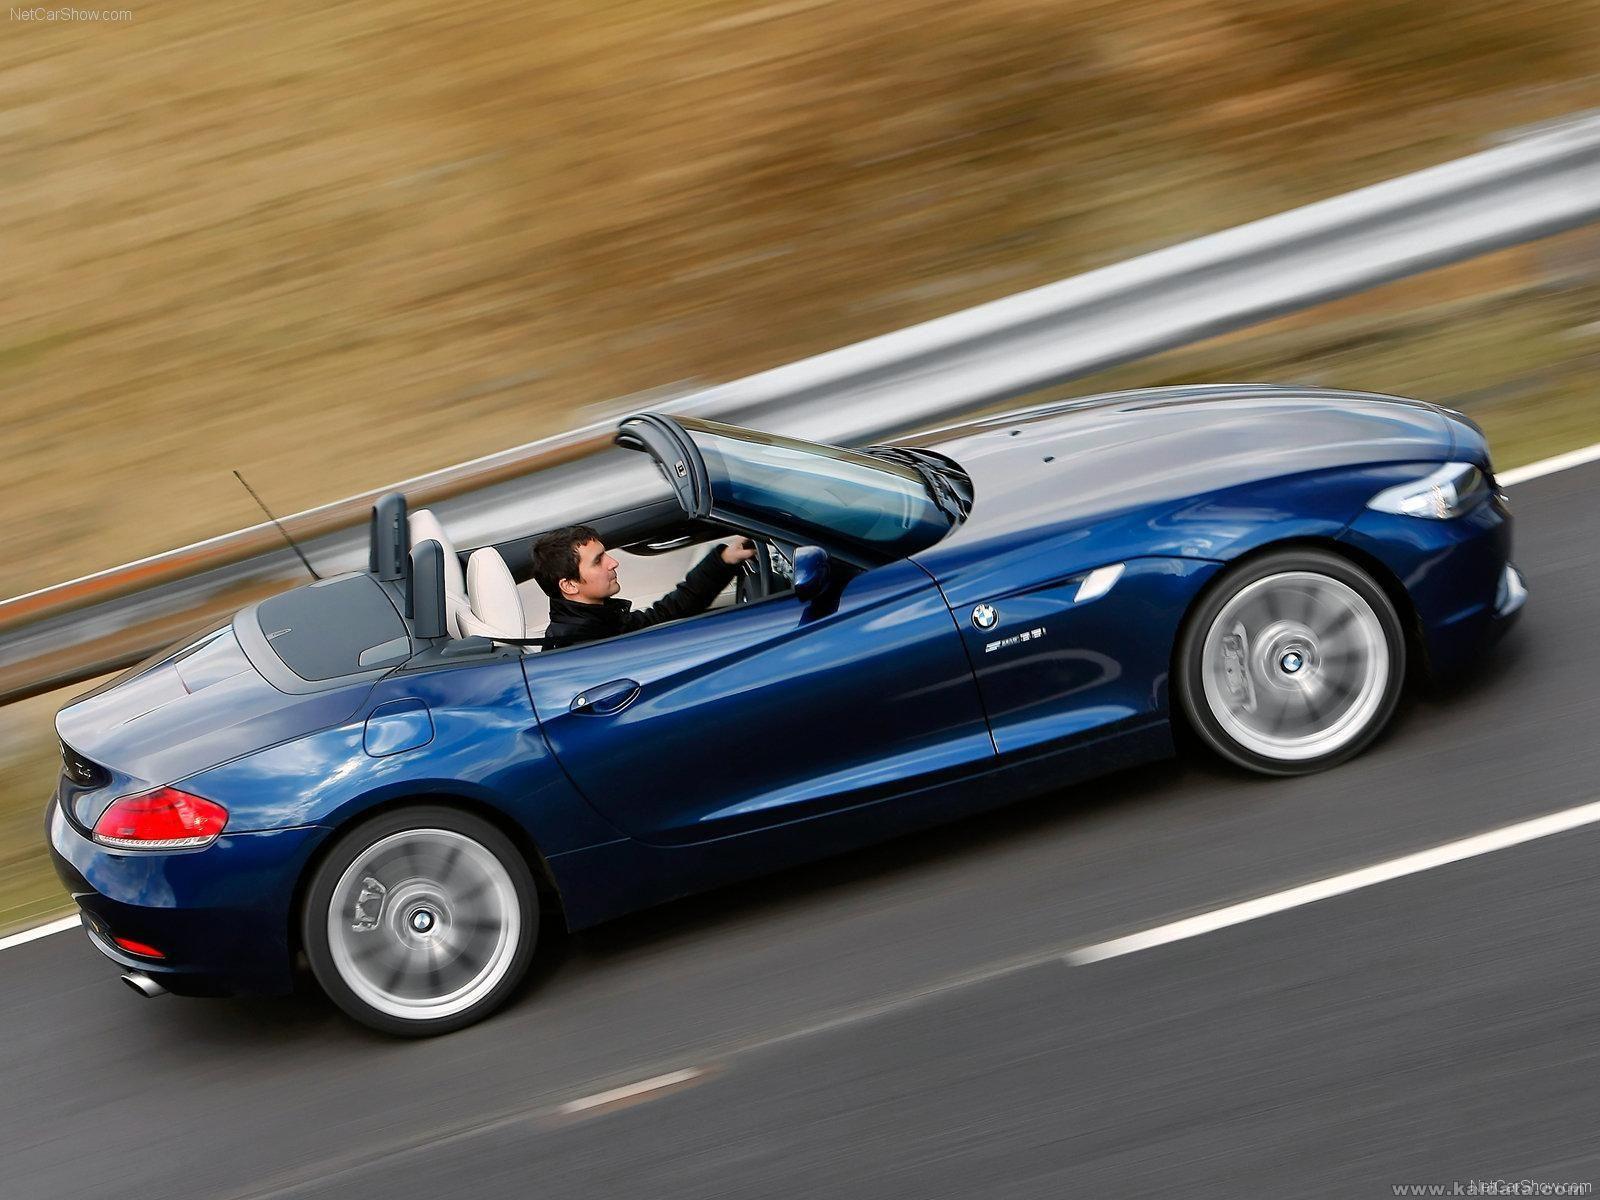 BMW-Z4_UK_Version_2010_1600x1200_wallpaper_07.jpg